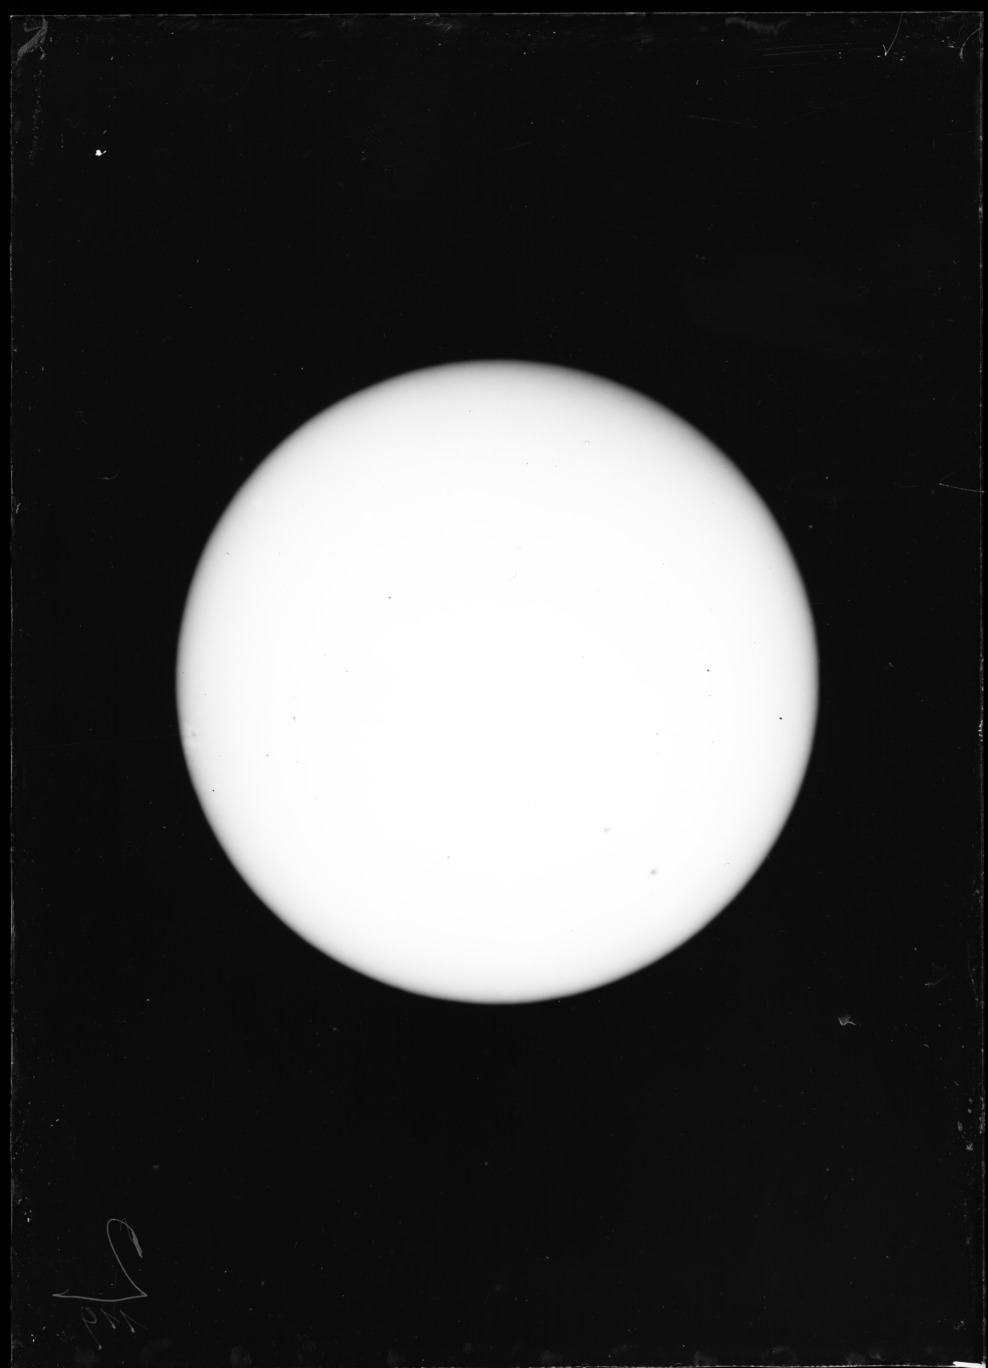 AGlV119